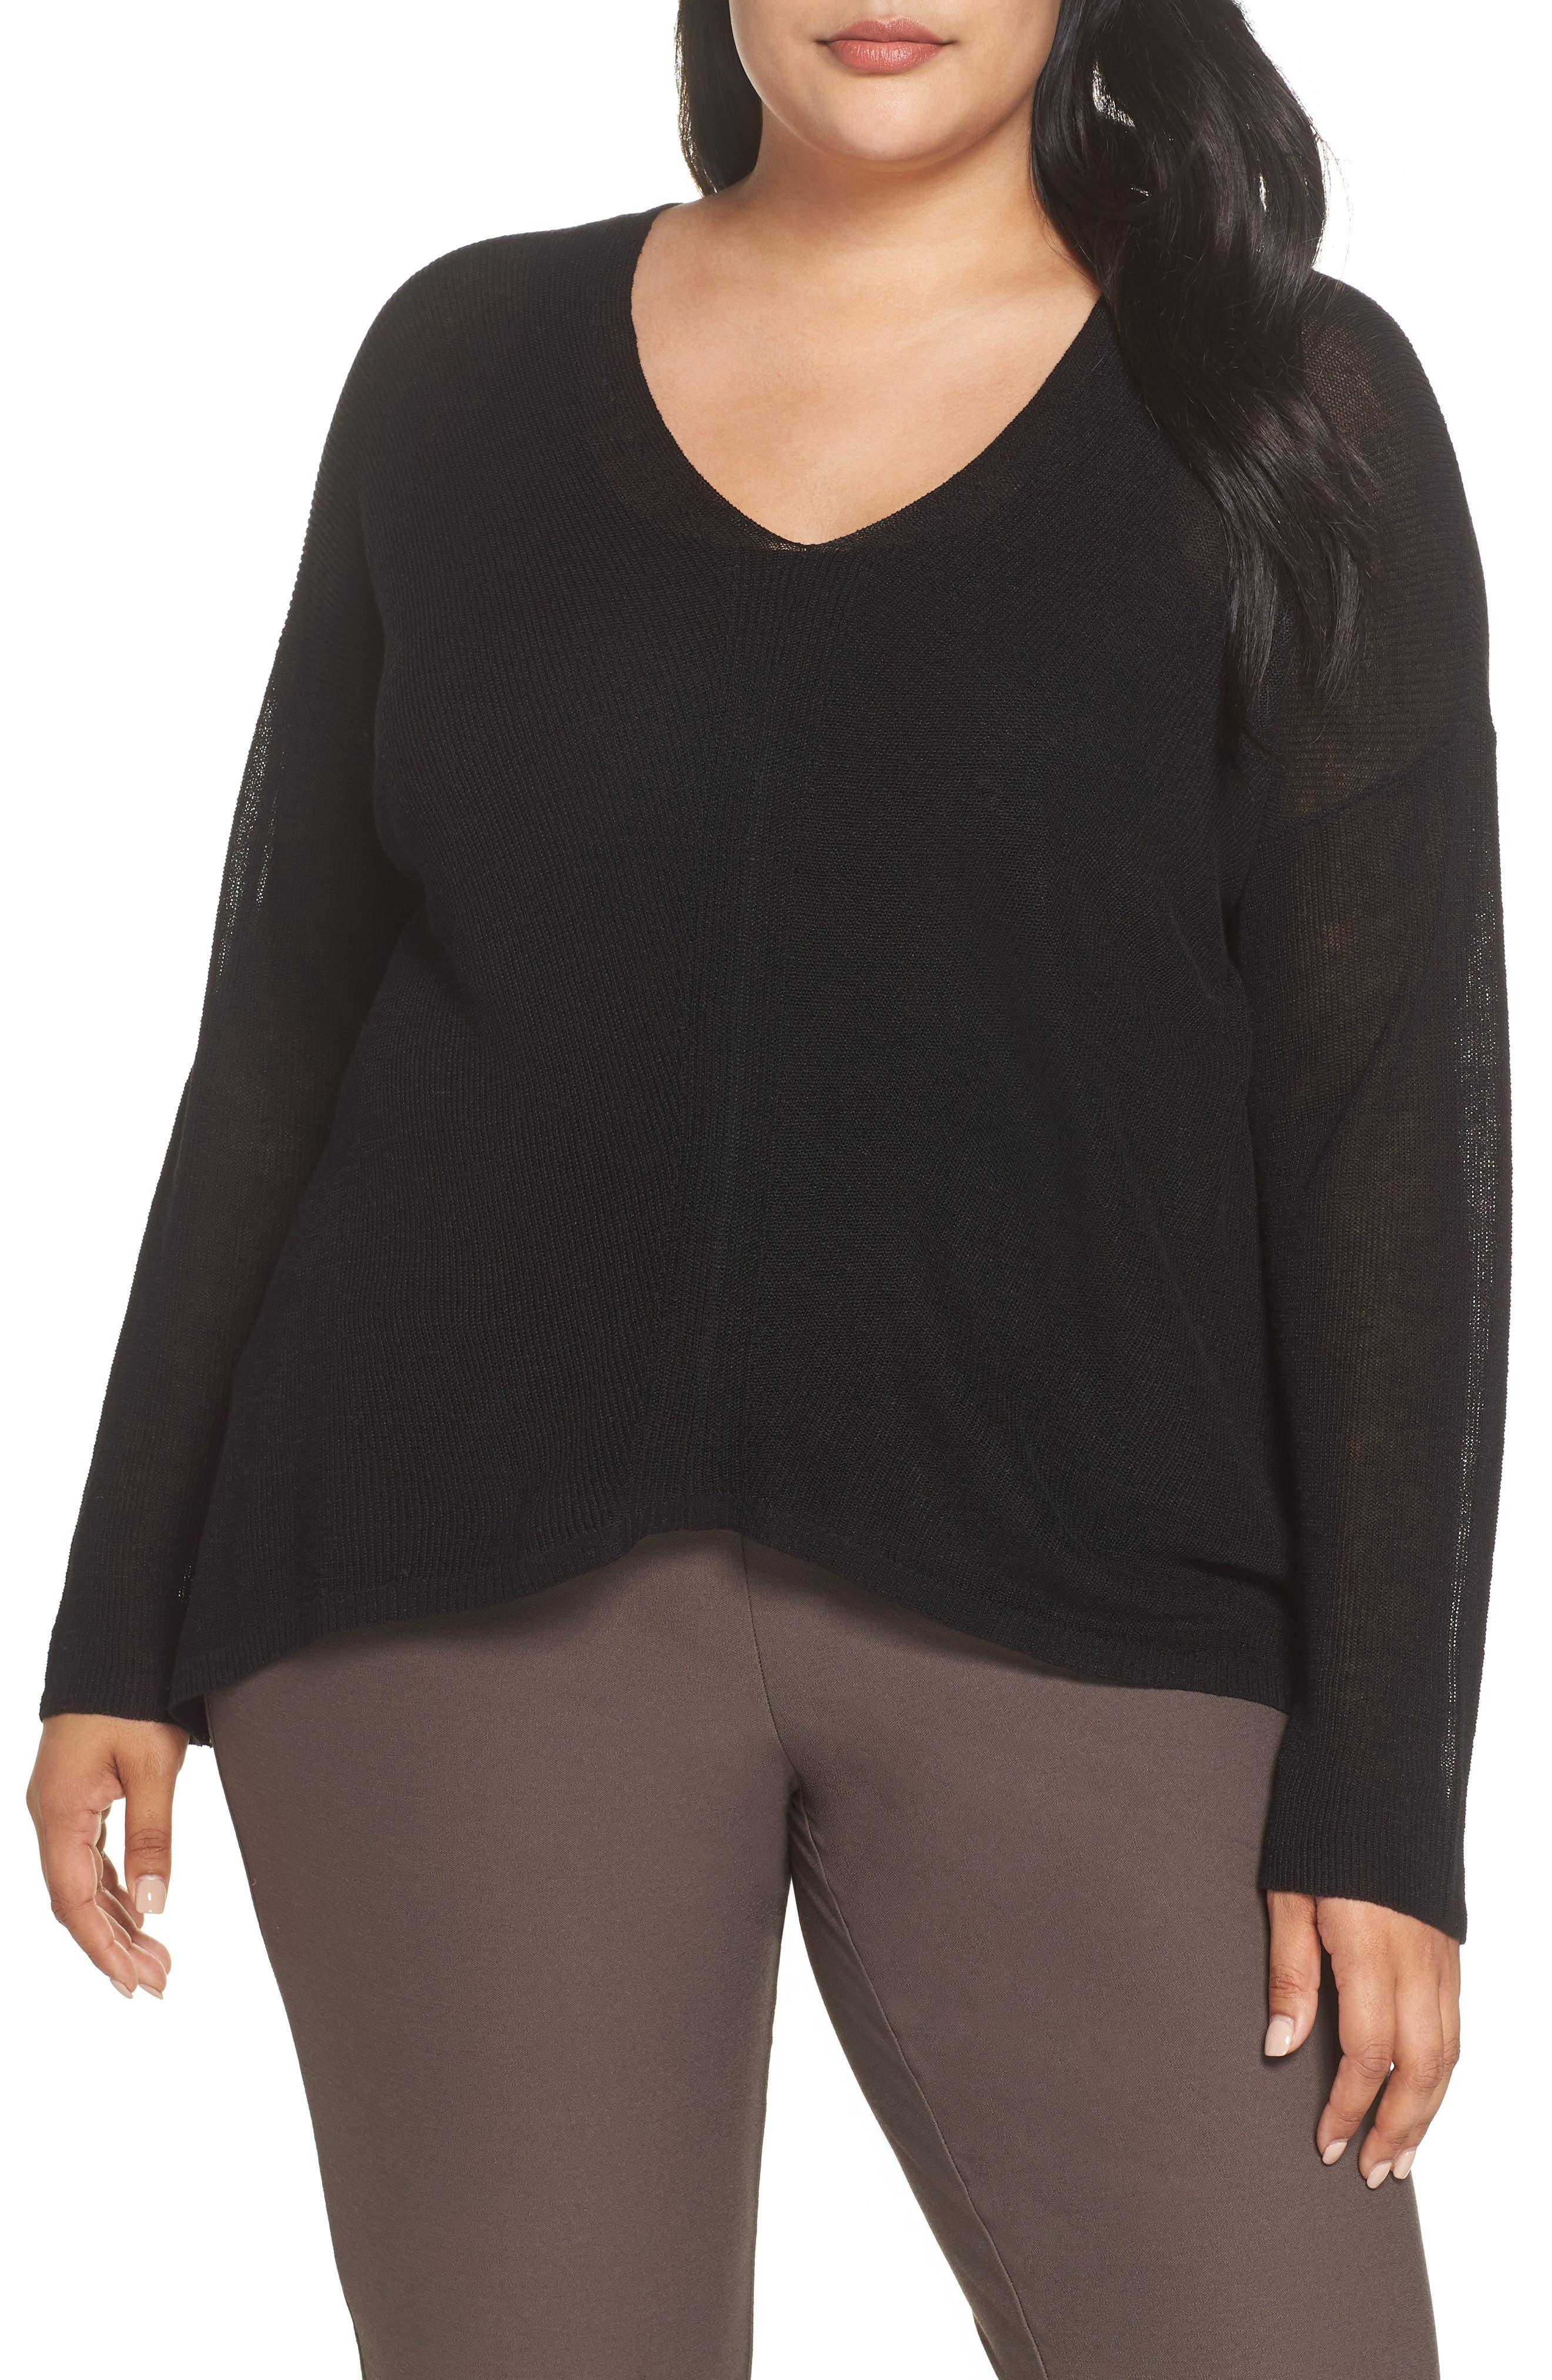 Boxy Organic Linen Blend Sweater,                             Main thumbnail 1, color,                             001